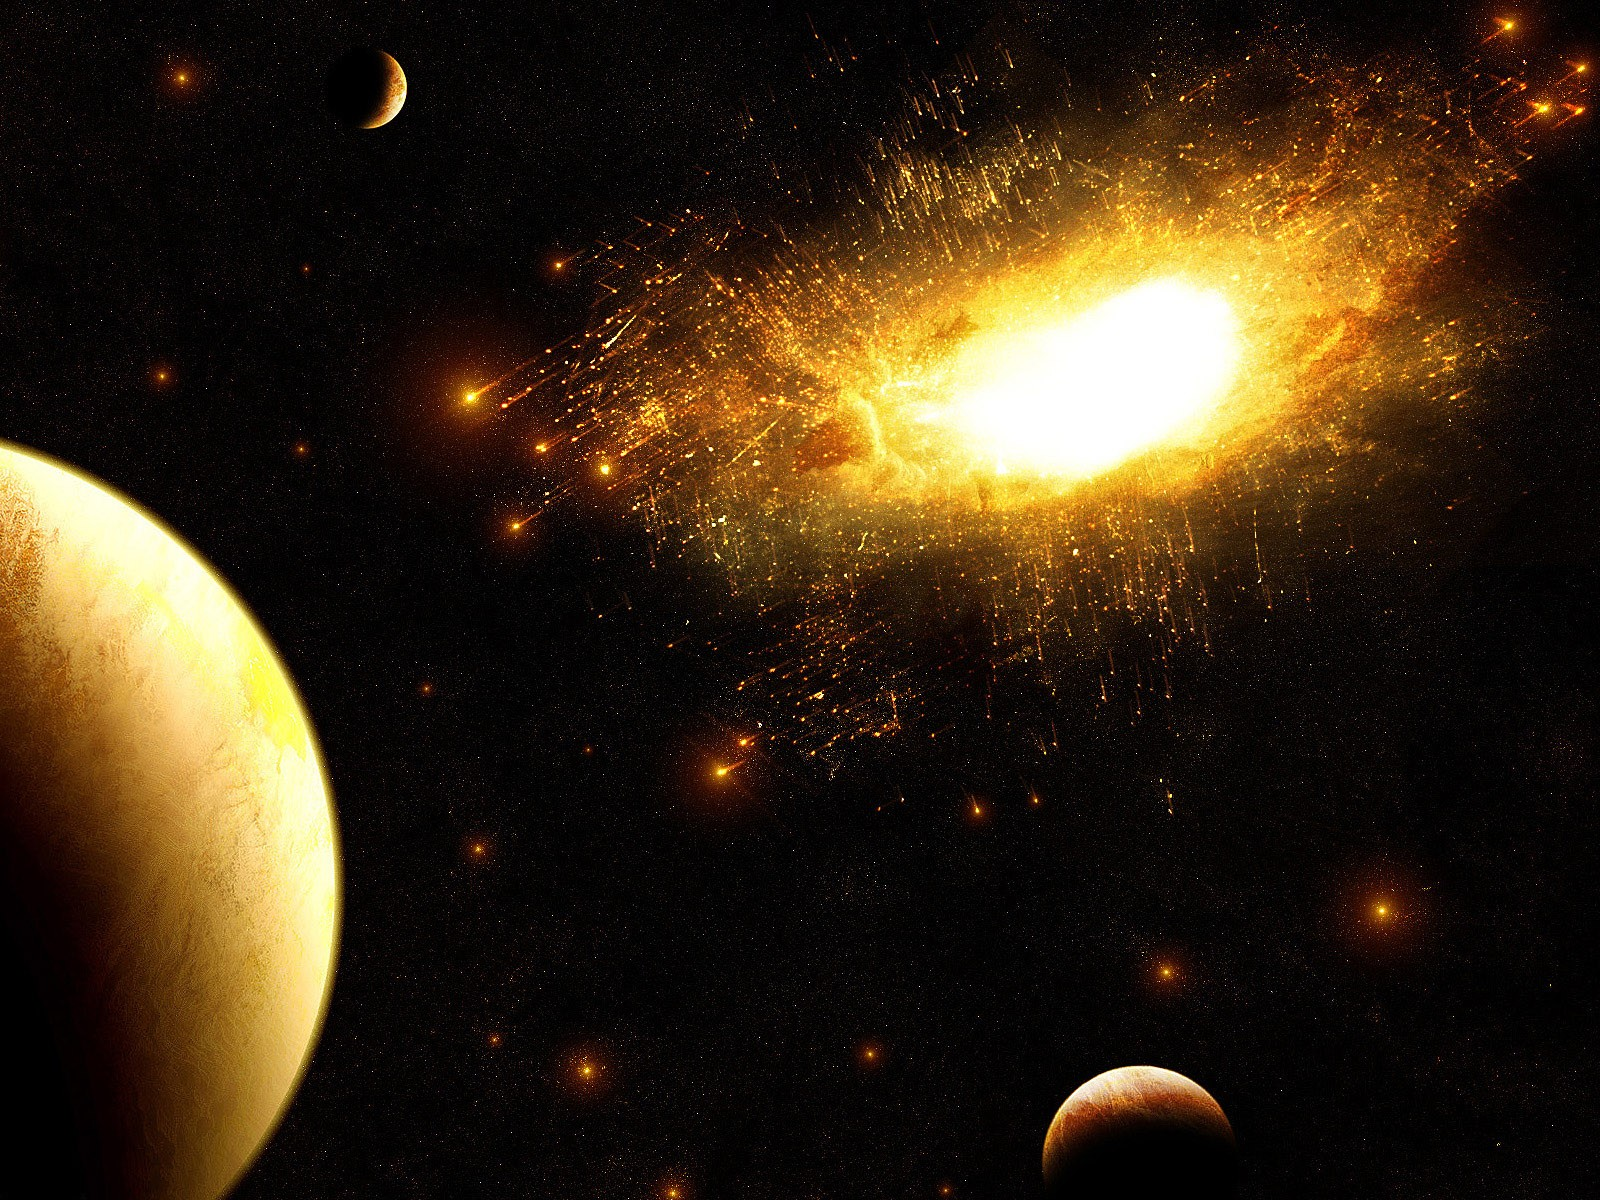 General 1600x1200 space art planet digital art